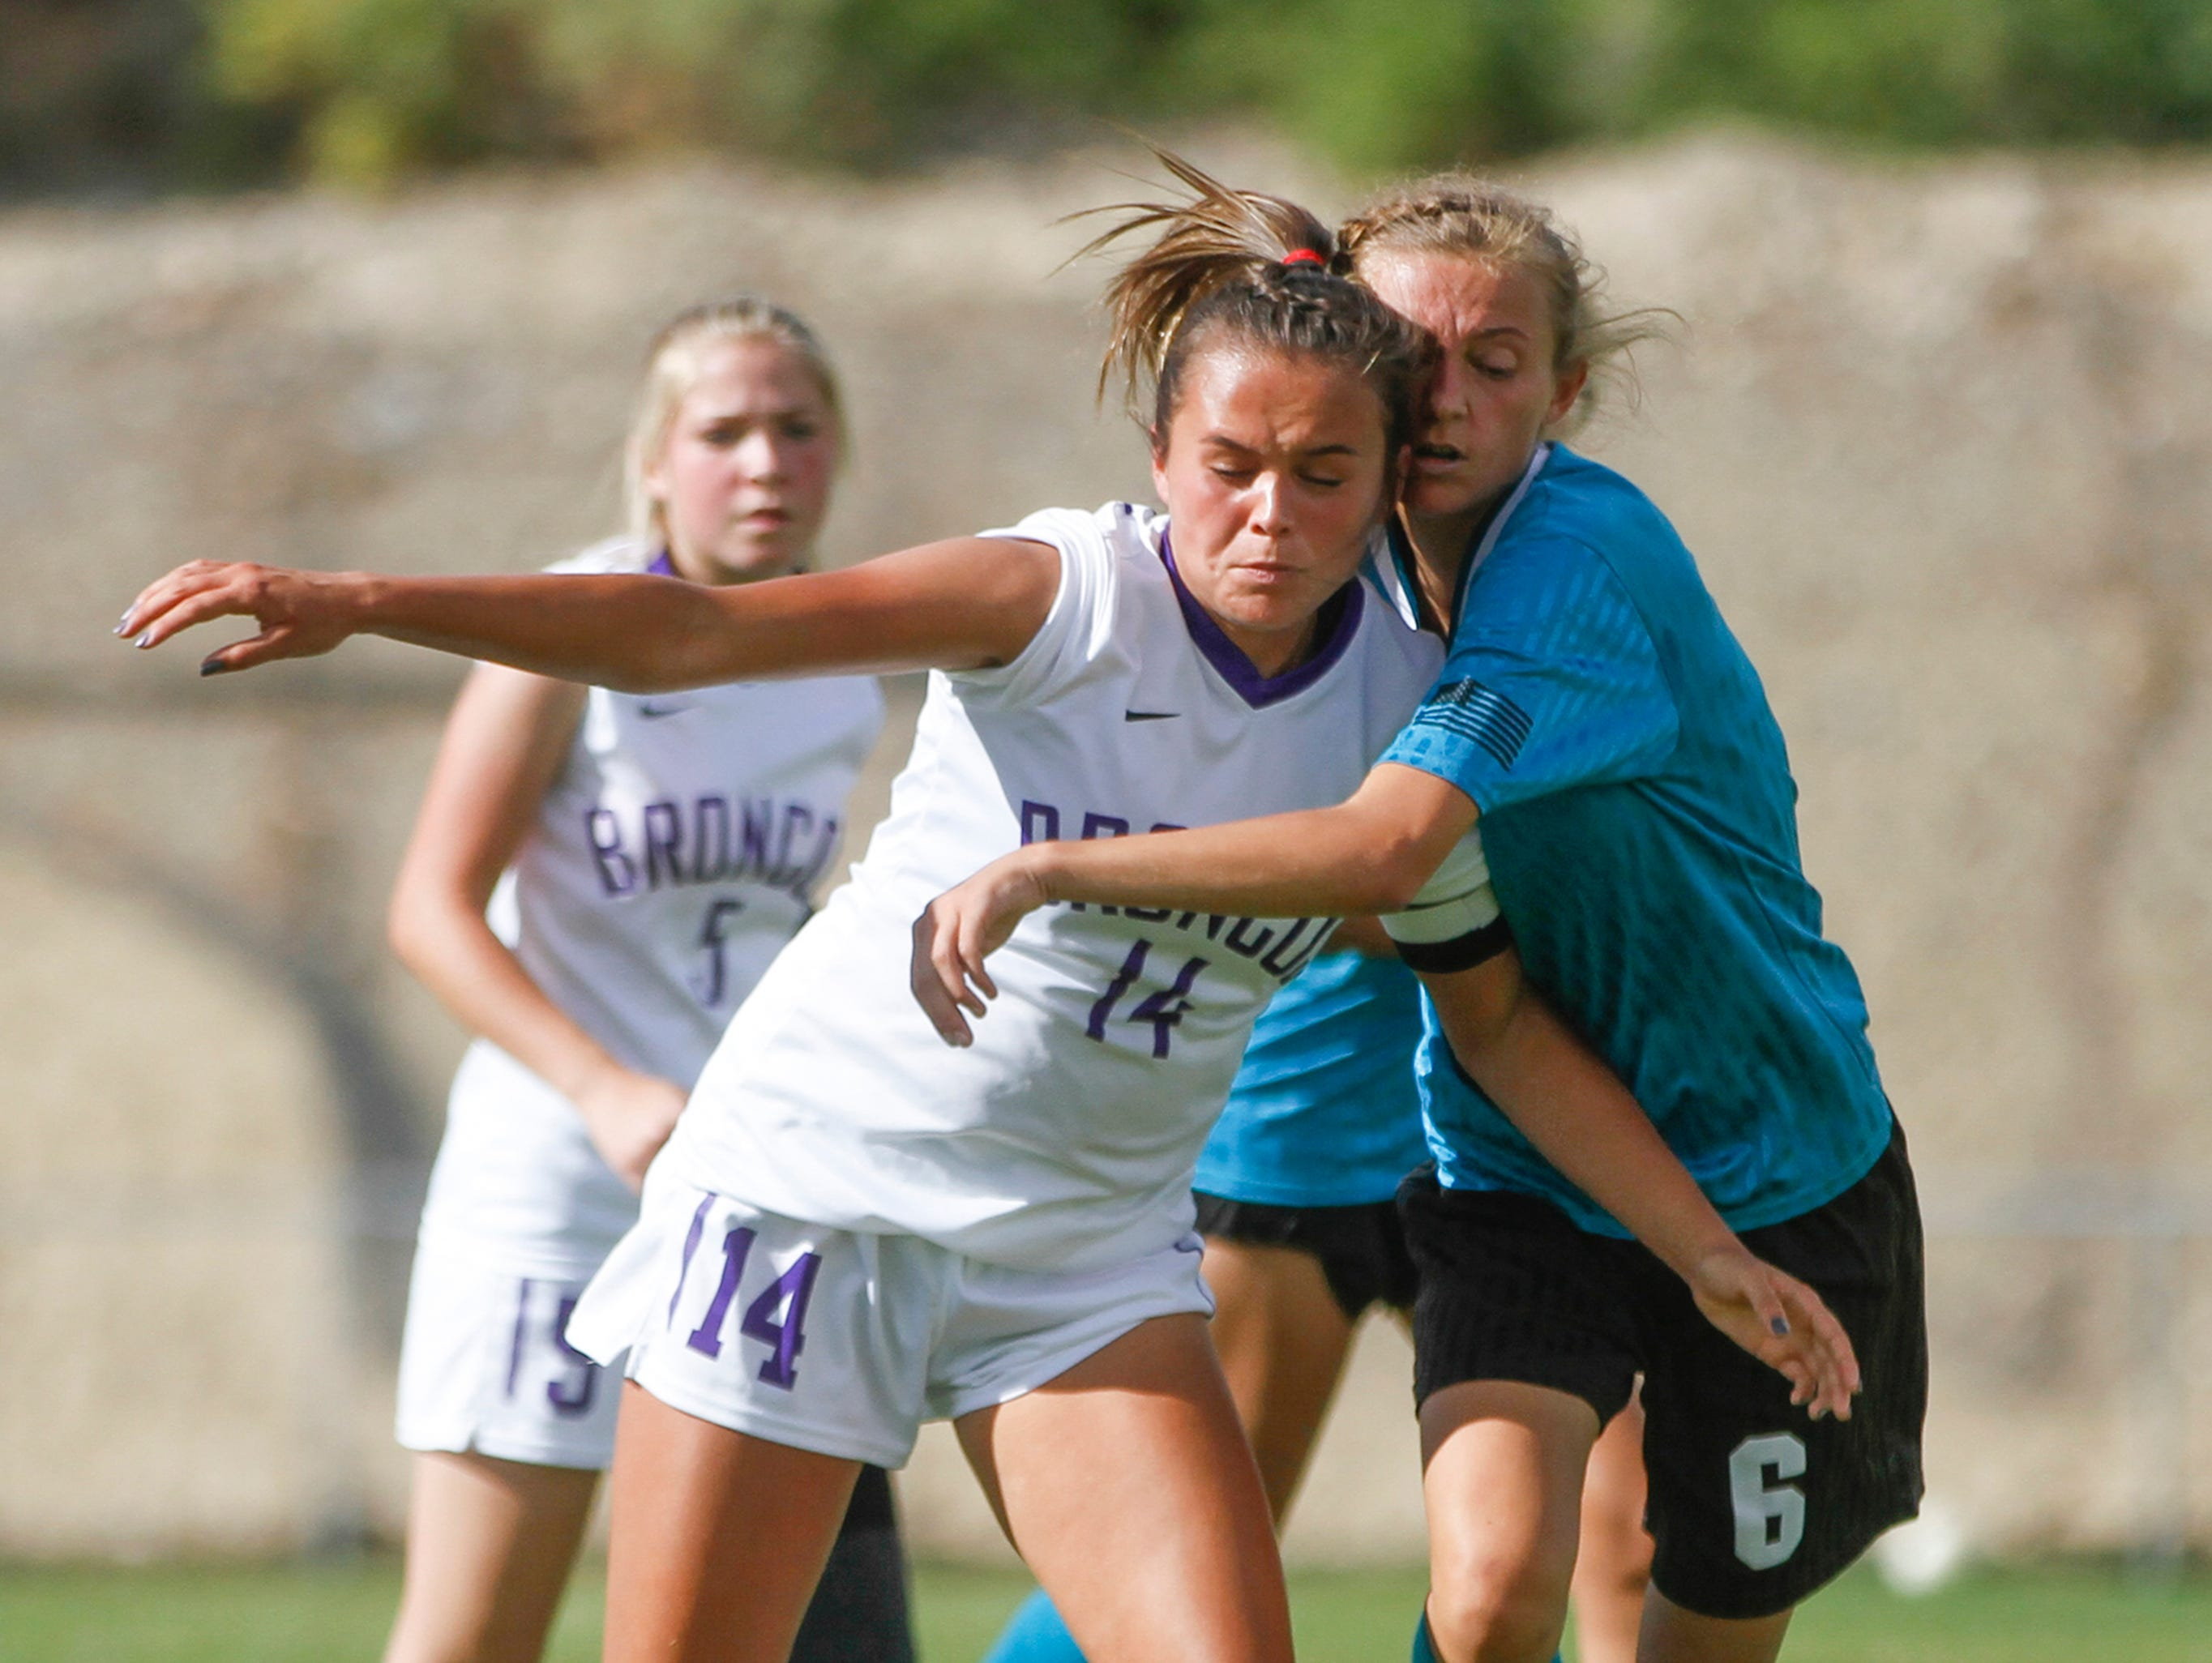 Navajo Prep's Emma Mohs challenges Kirtland Central's Hayden Alldredge for possession on the ball, Thursday, Sept. 6, 2018 at Navajo Prep's Eagle Stadium in Farmington.